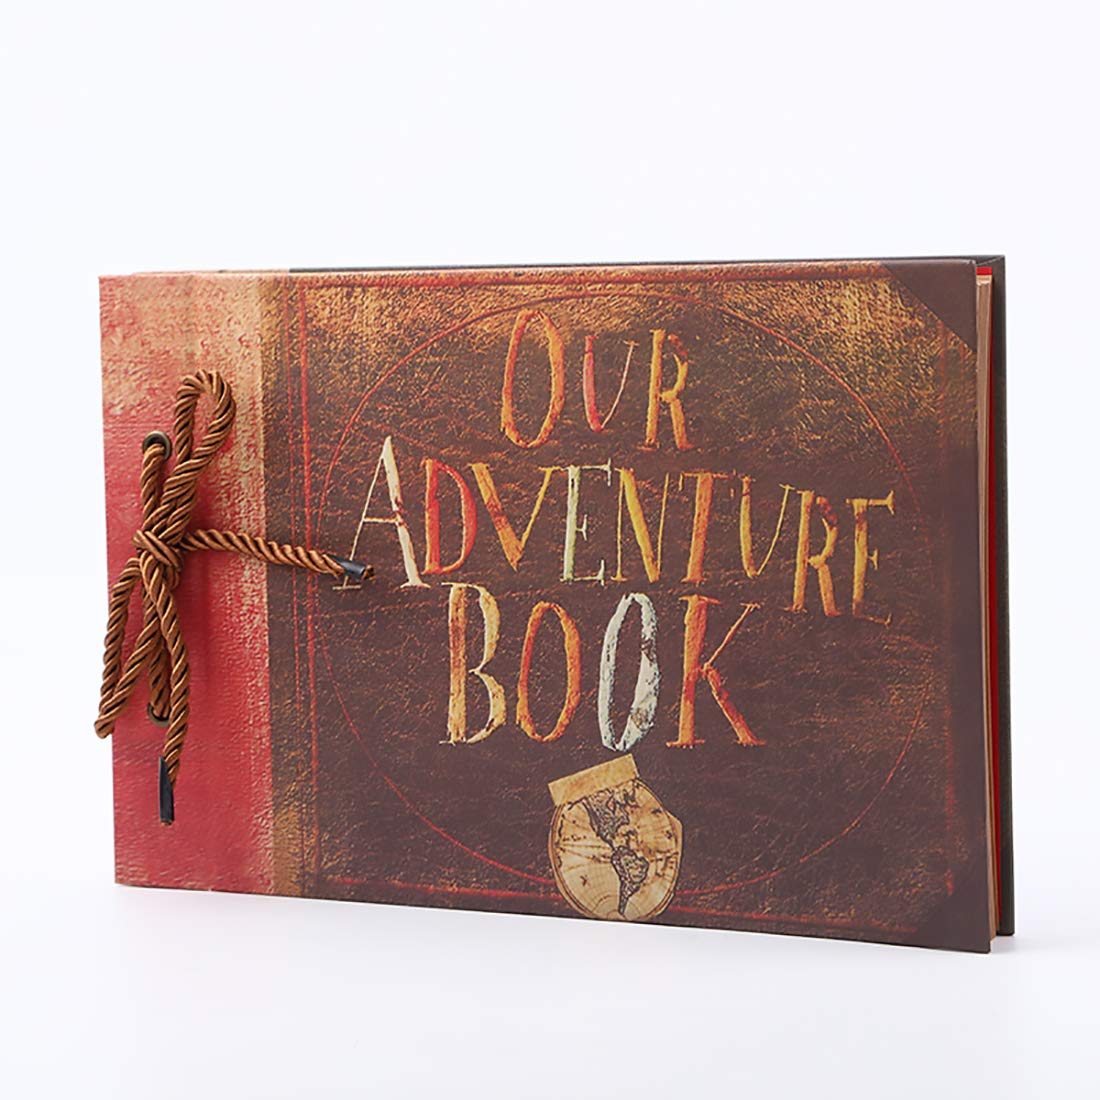 Geqian1982 Photo Album Scrapbook Engraved Our Adventure Book Baby Shower Honeymoon Wedding Love Gift Box Accessory Kit